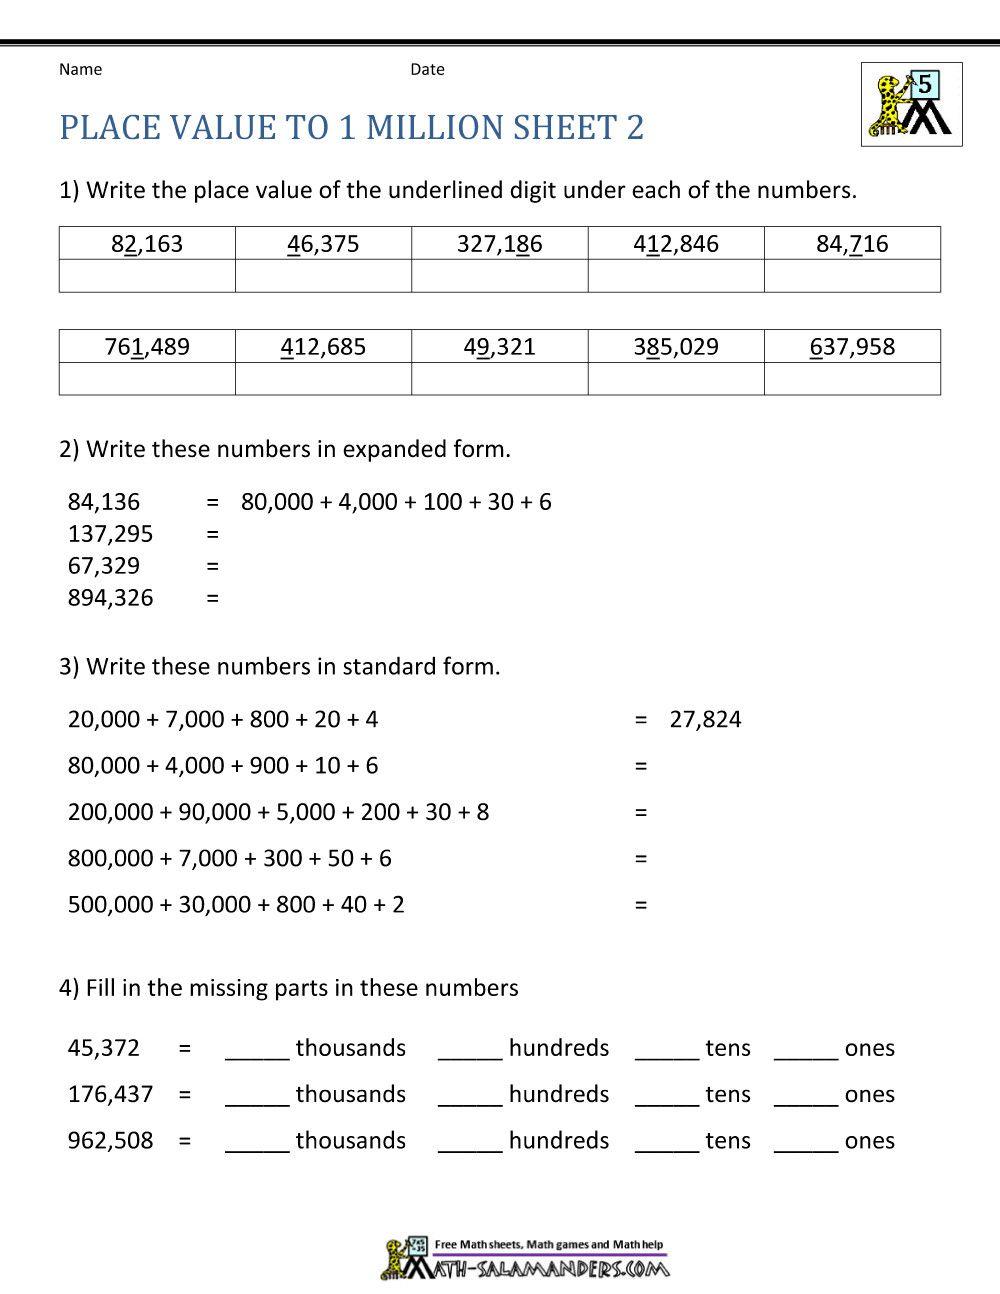 3 Free Math Worksheets Sixth Grade 6 Decimals Multiplication Multiplying Decimals Missing Fac In 2020 Place Value Worksheets Free Math Worksheets Math Worksheets